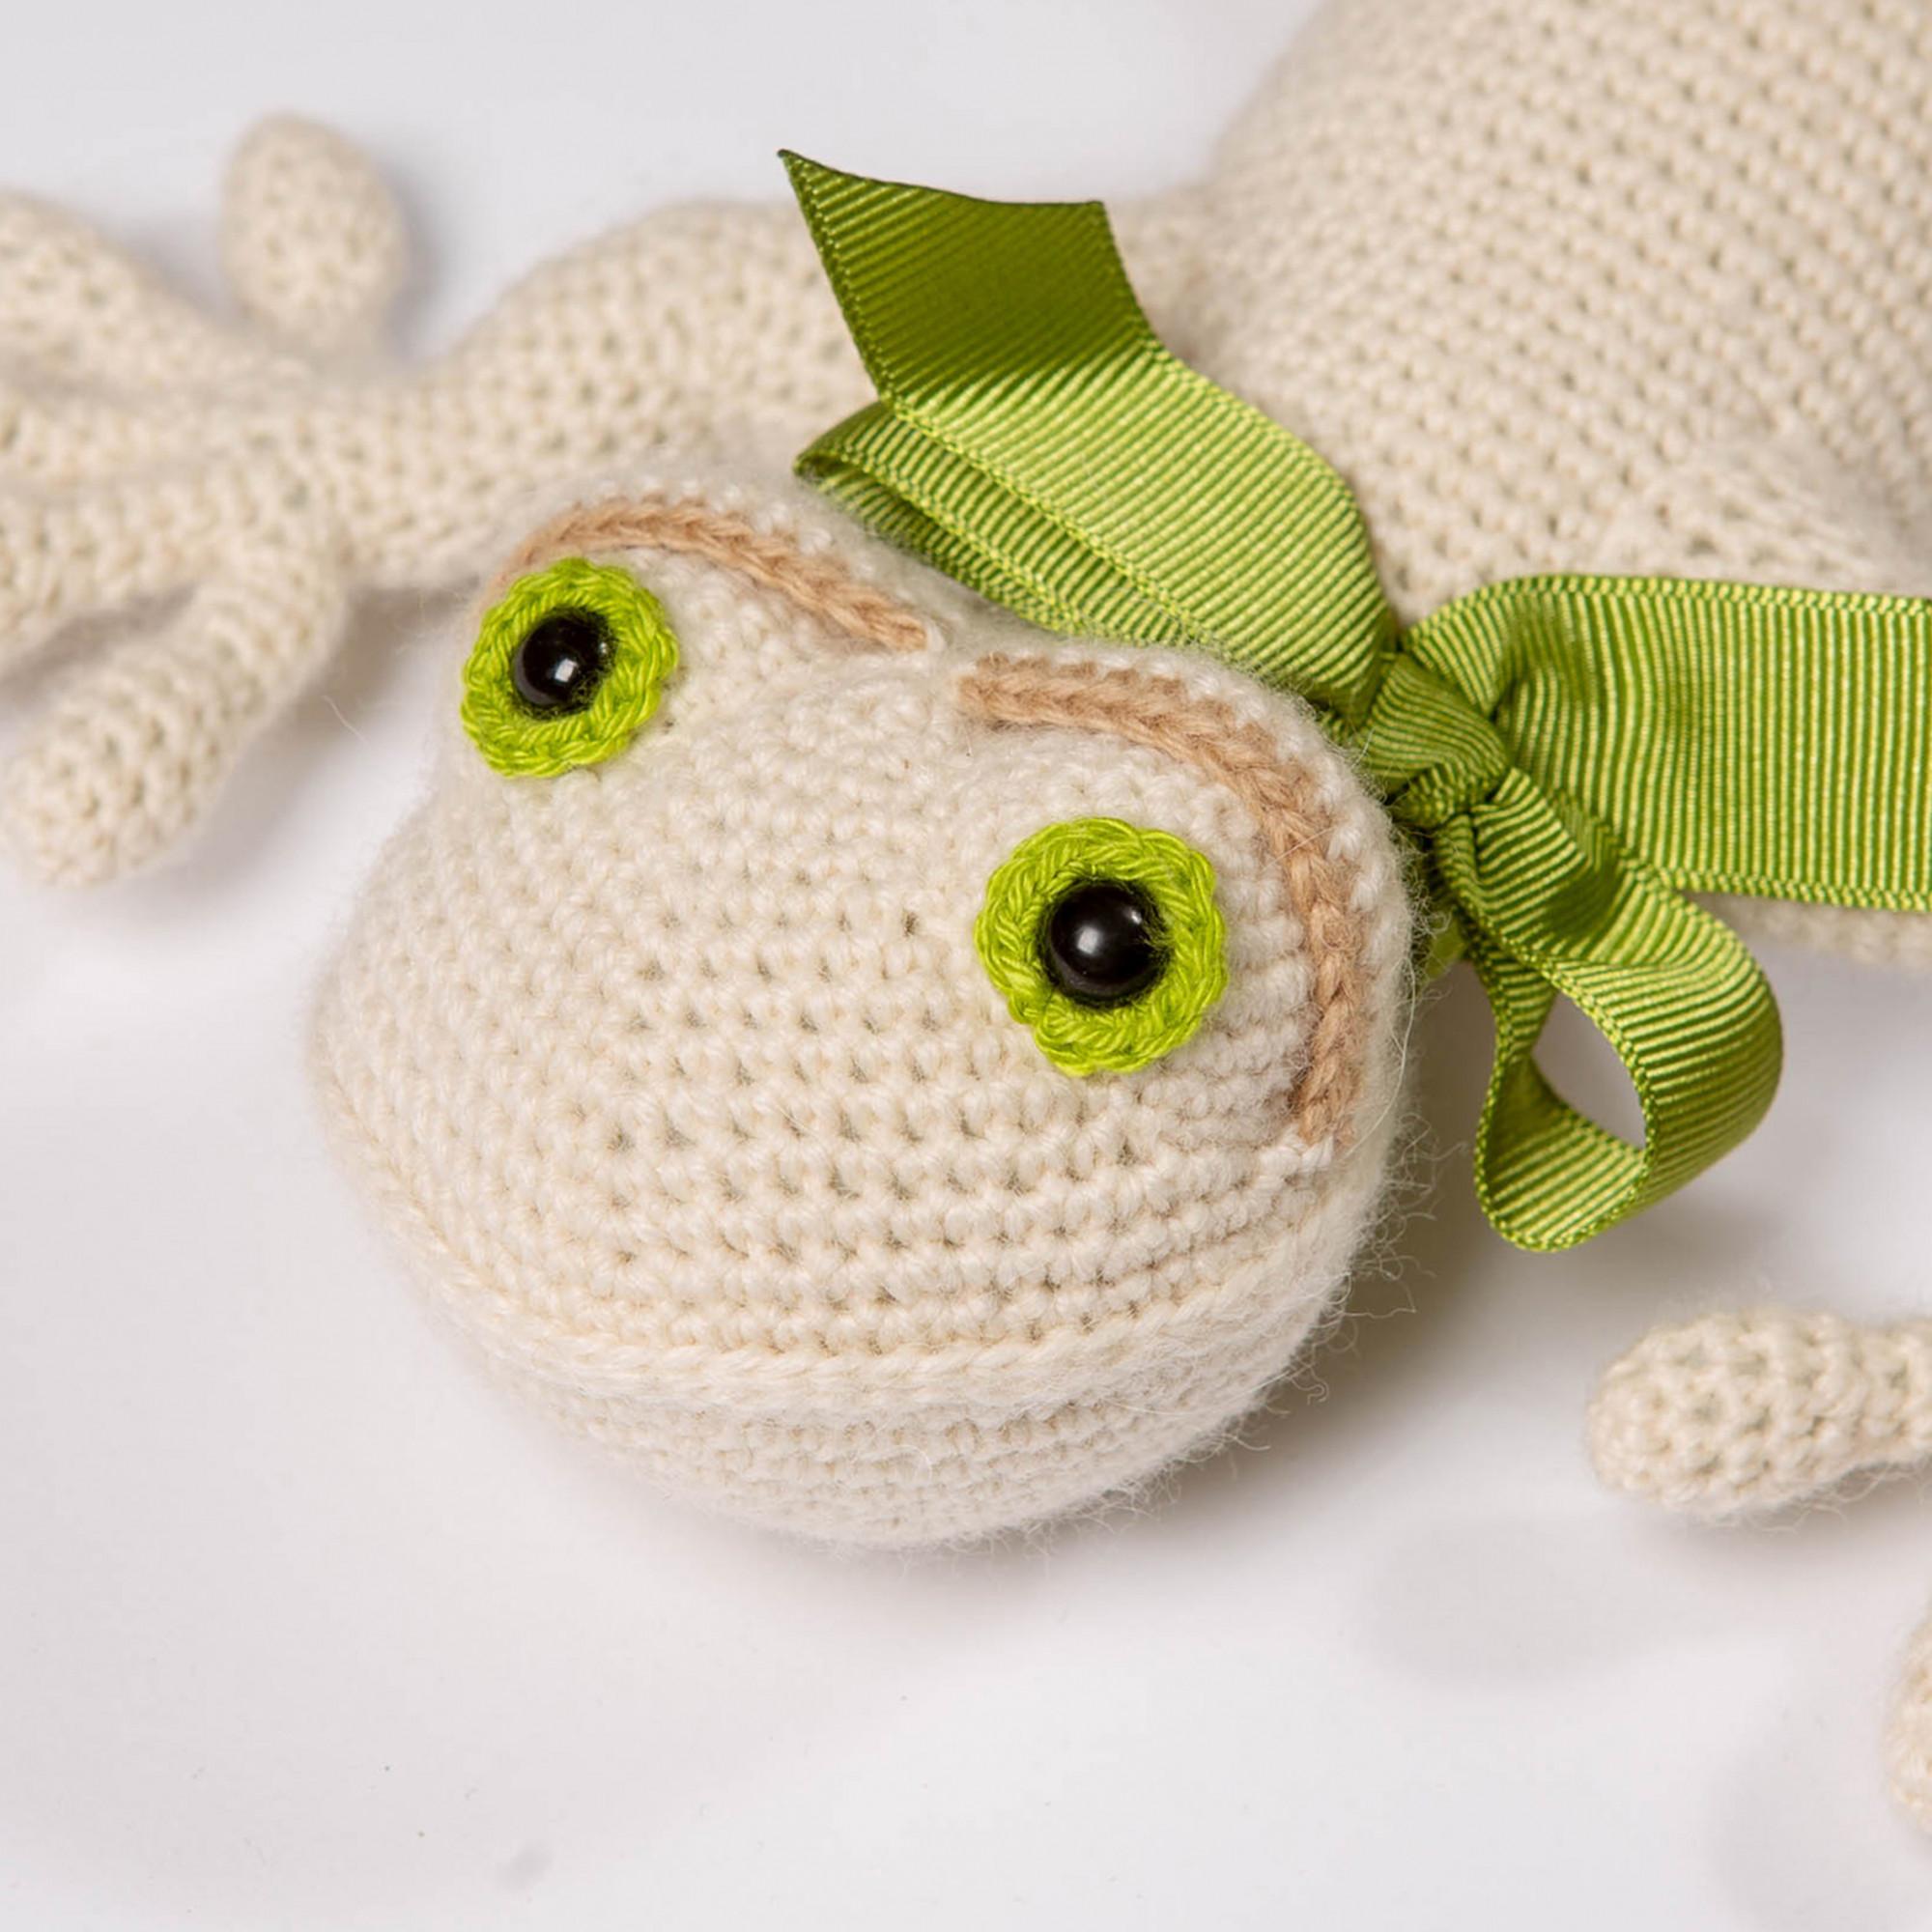 Gift Frog for children. Crocheted soft toy